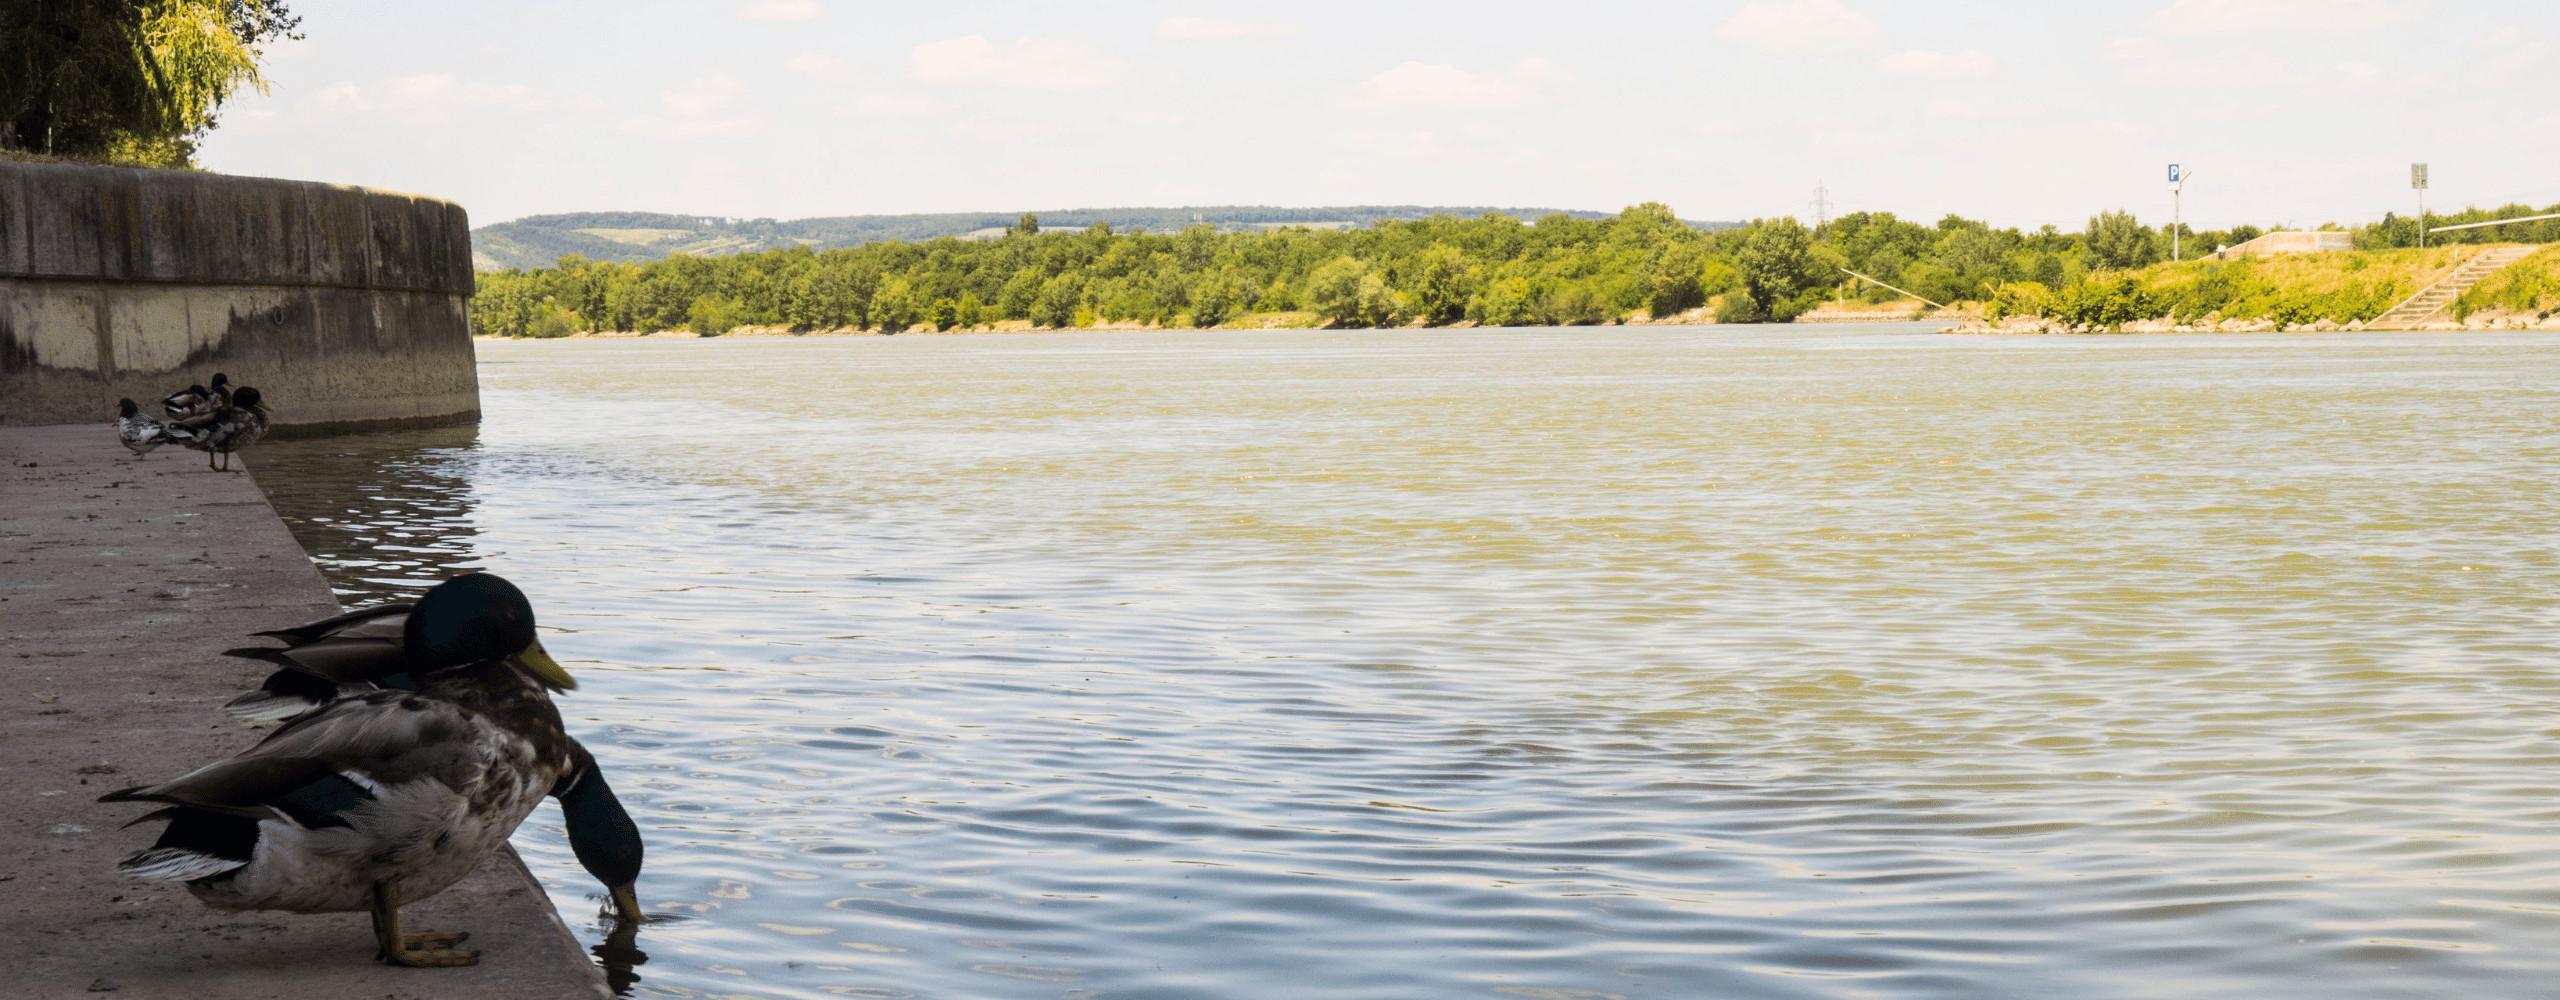 Enten am Donauufer (Copyright: Sarah Vierthaler)